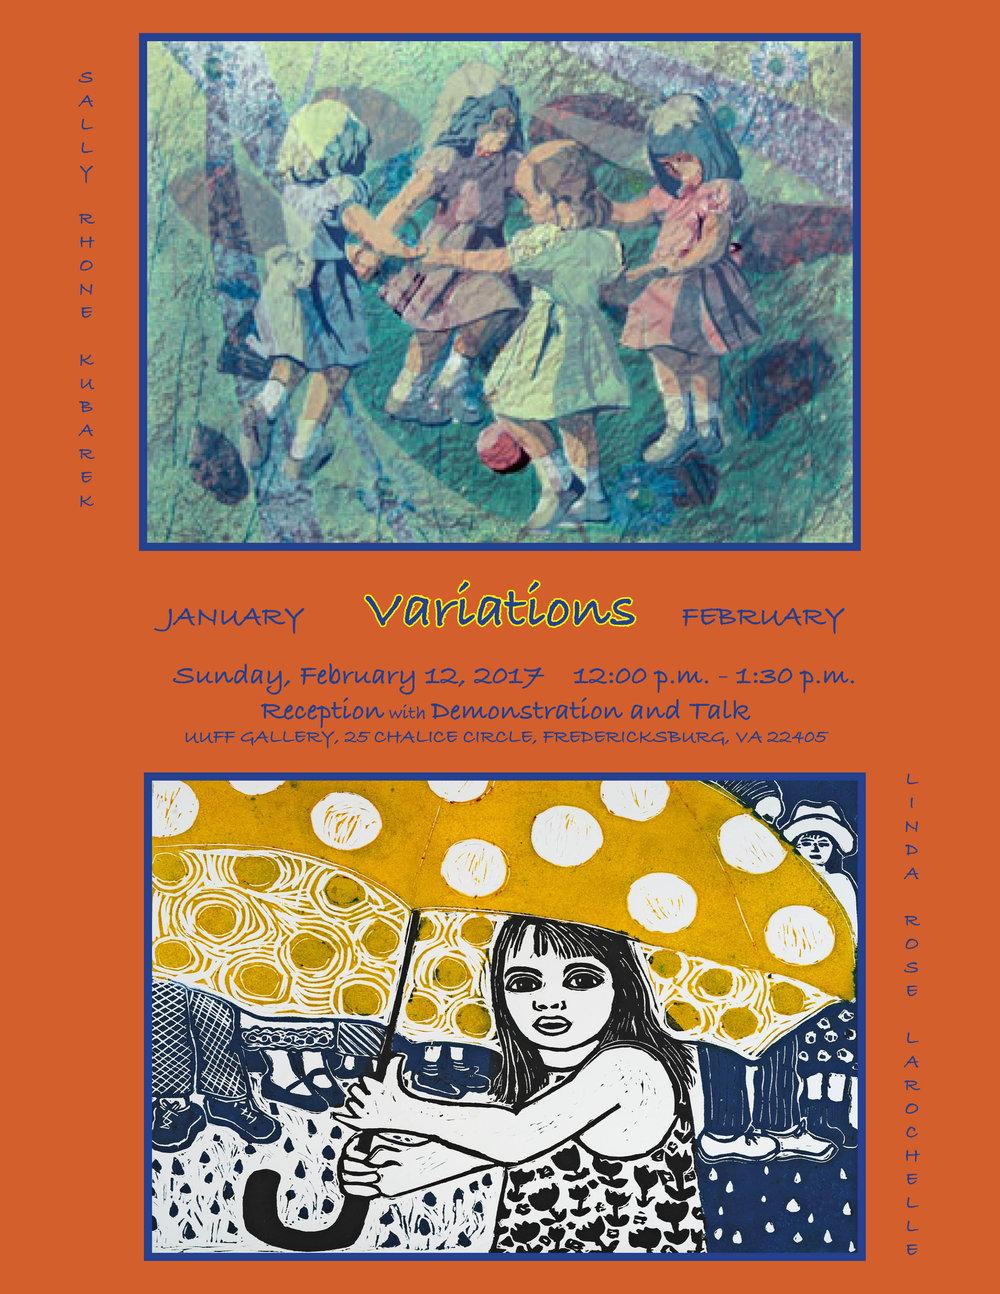 Kubarek Larochelle UUFF Gallery Poster.jpg